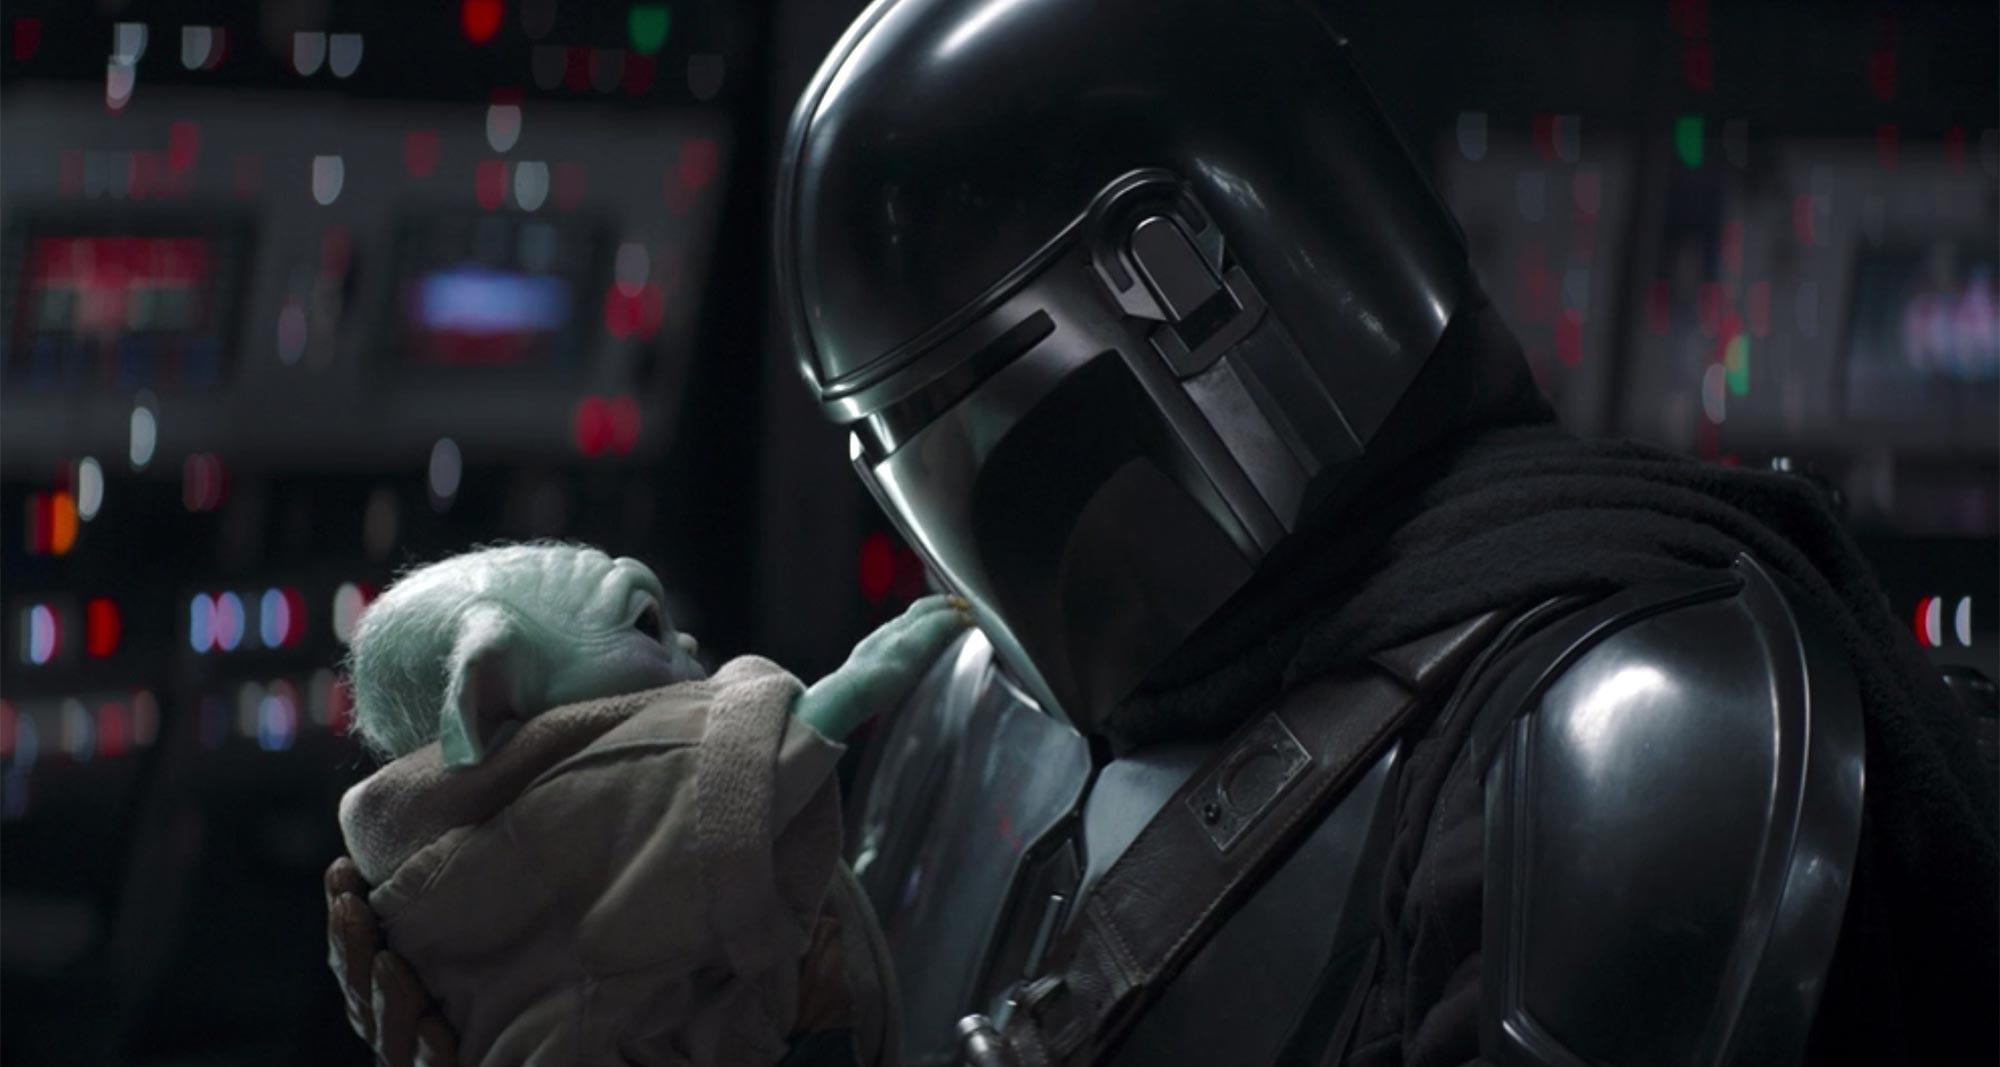 The Mandalorian cradles Grogu, a.k.a. Baby Yoda, before sending him off to train with Luke Skywalker.